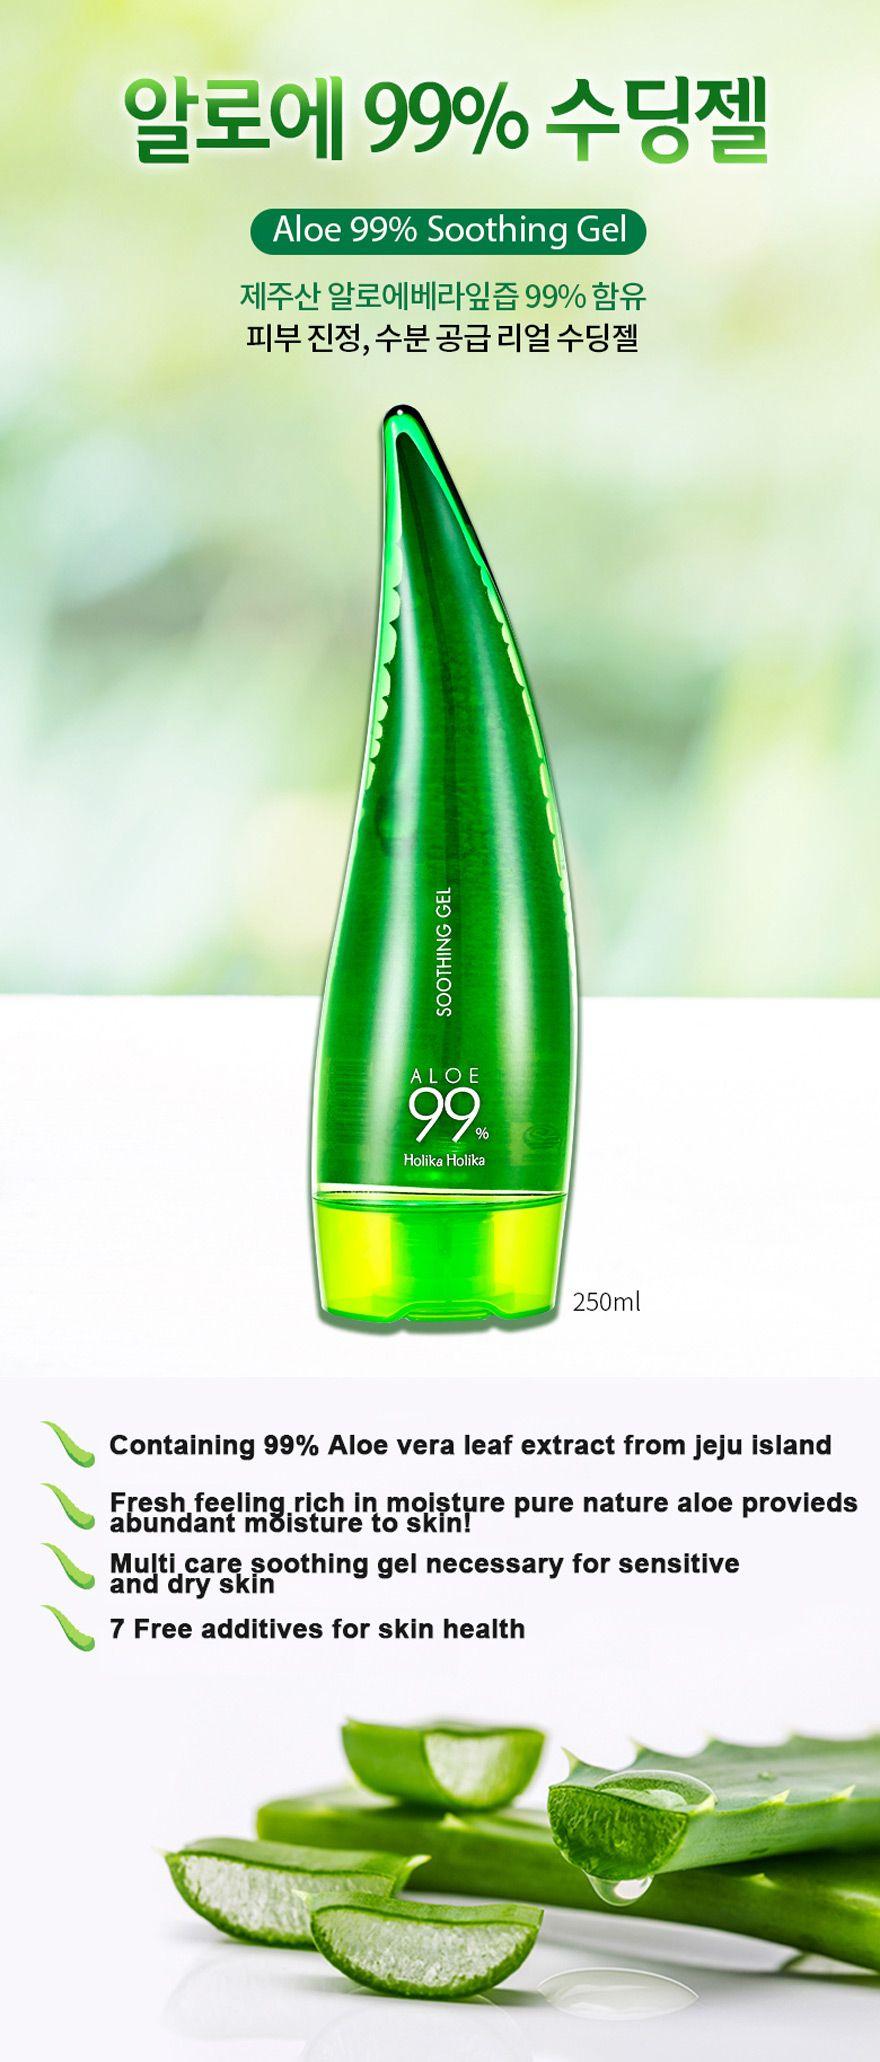 Fe827131684068a1af061661b96f4d28 1481612 Want Pinterest Aloe K Beauty Jeju Fresh Vera Shooting Gel Nature